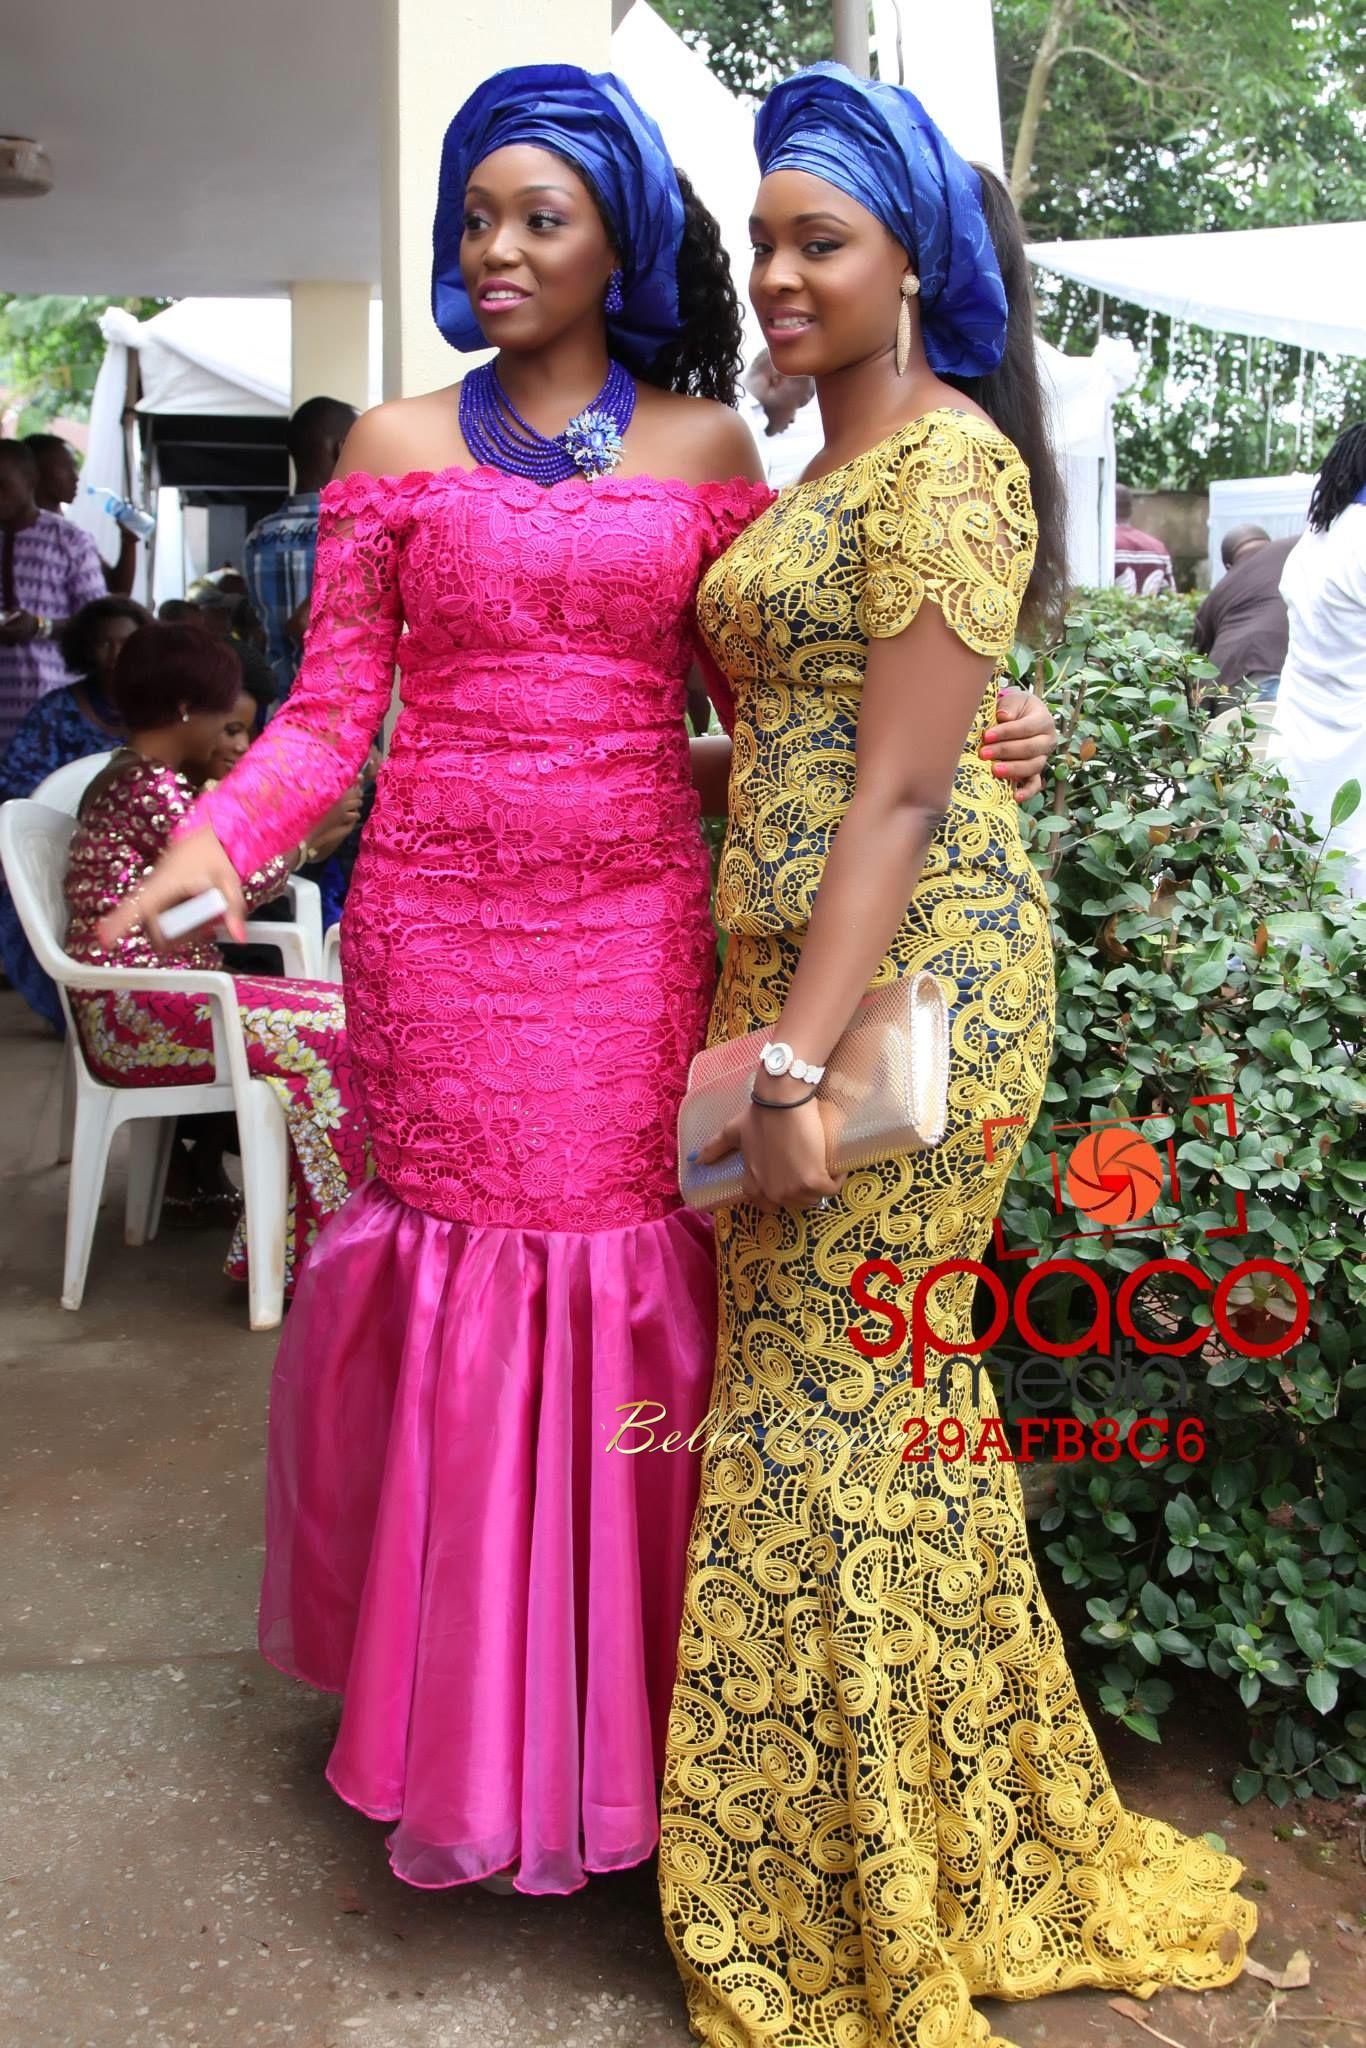 Jude-Okoye-and-Ify-Traditional-Igbo-Wedding-in-Anambra-SpacoMedia ...